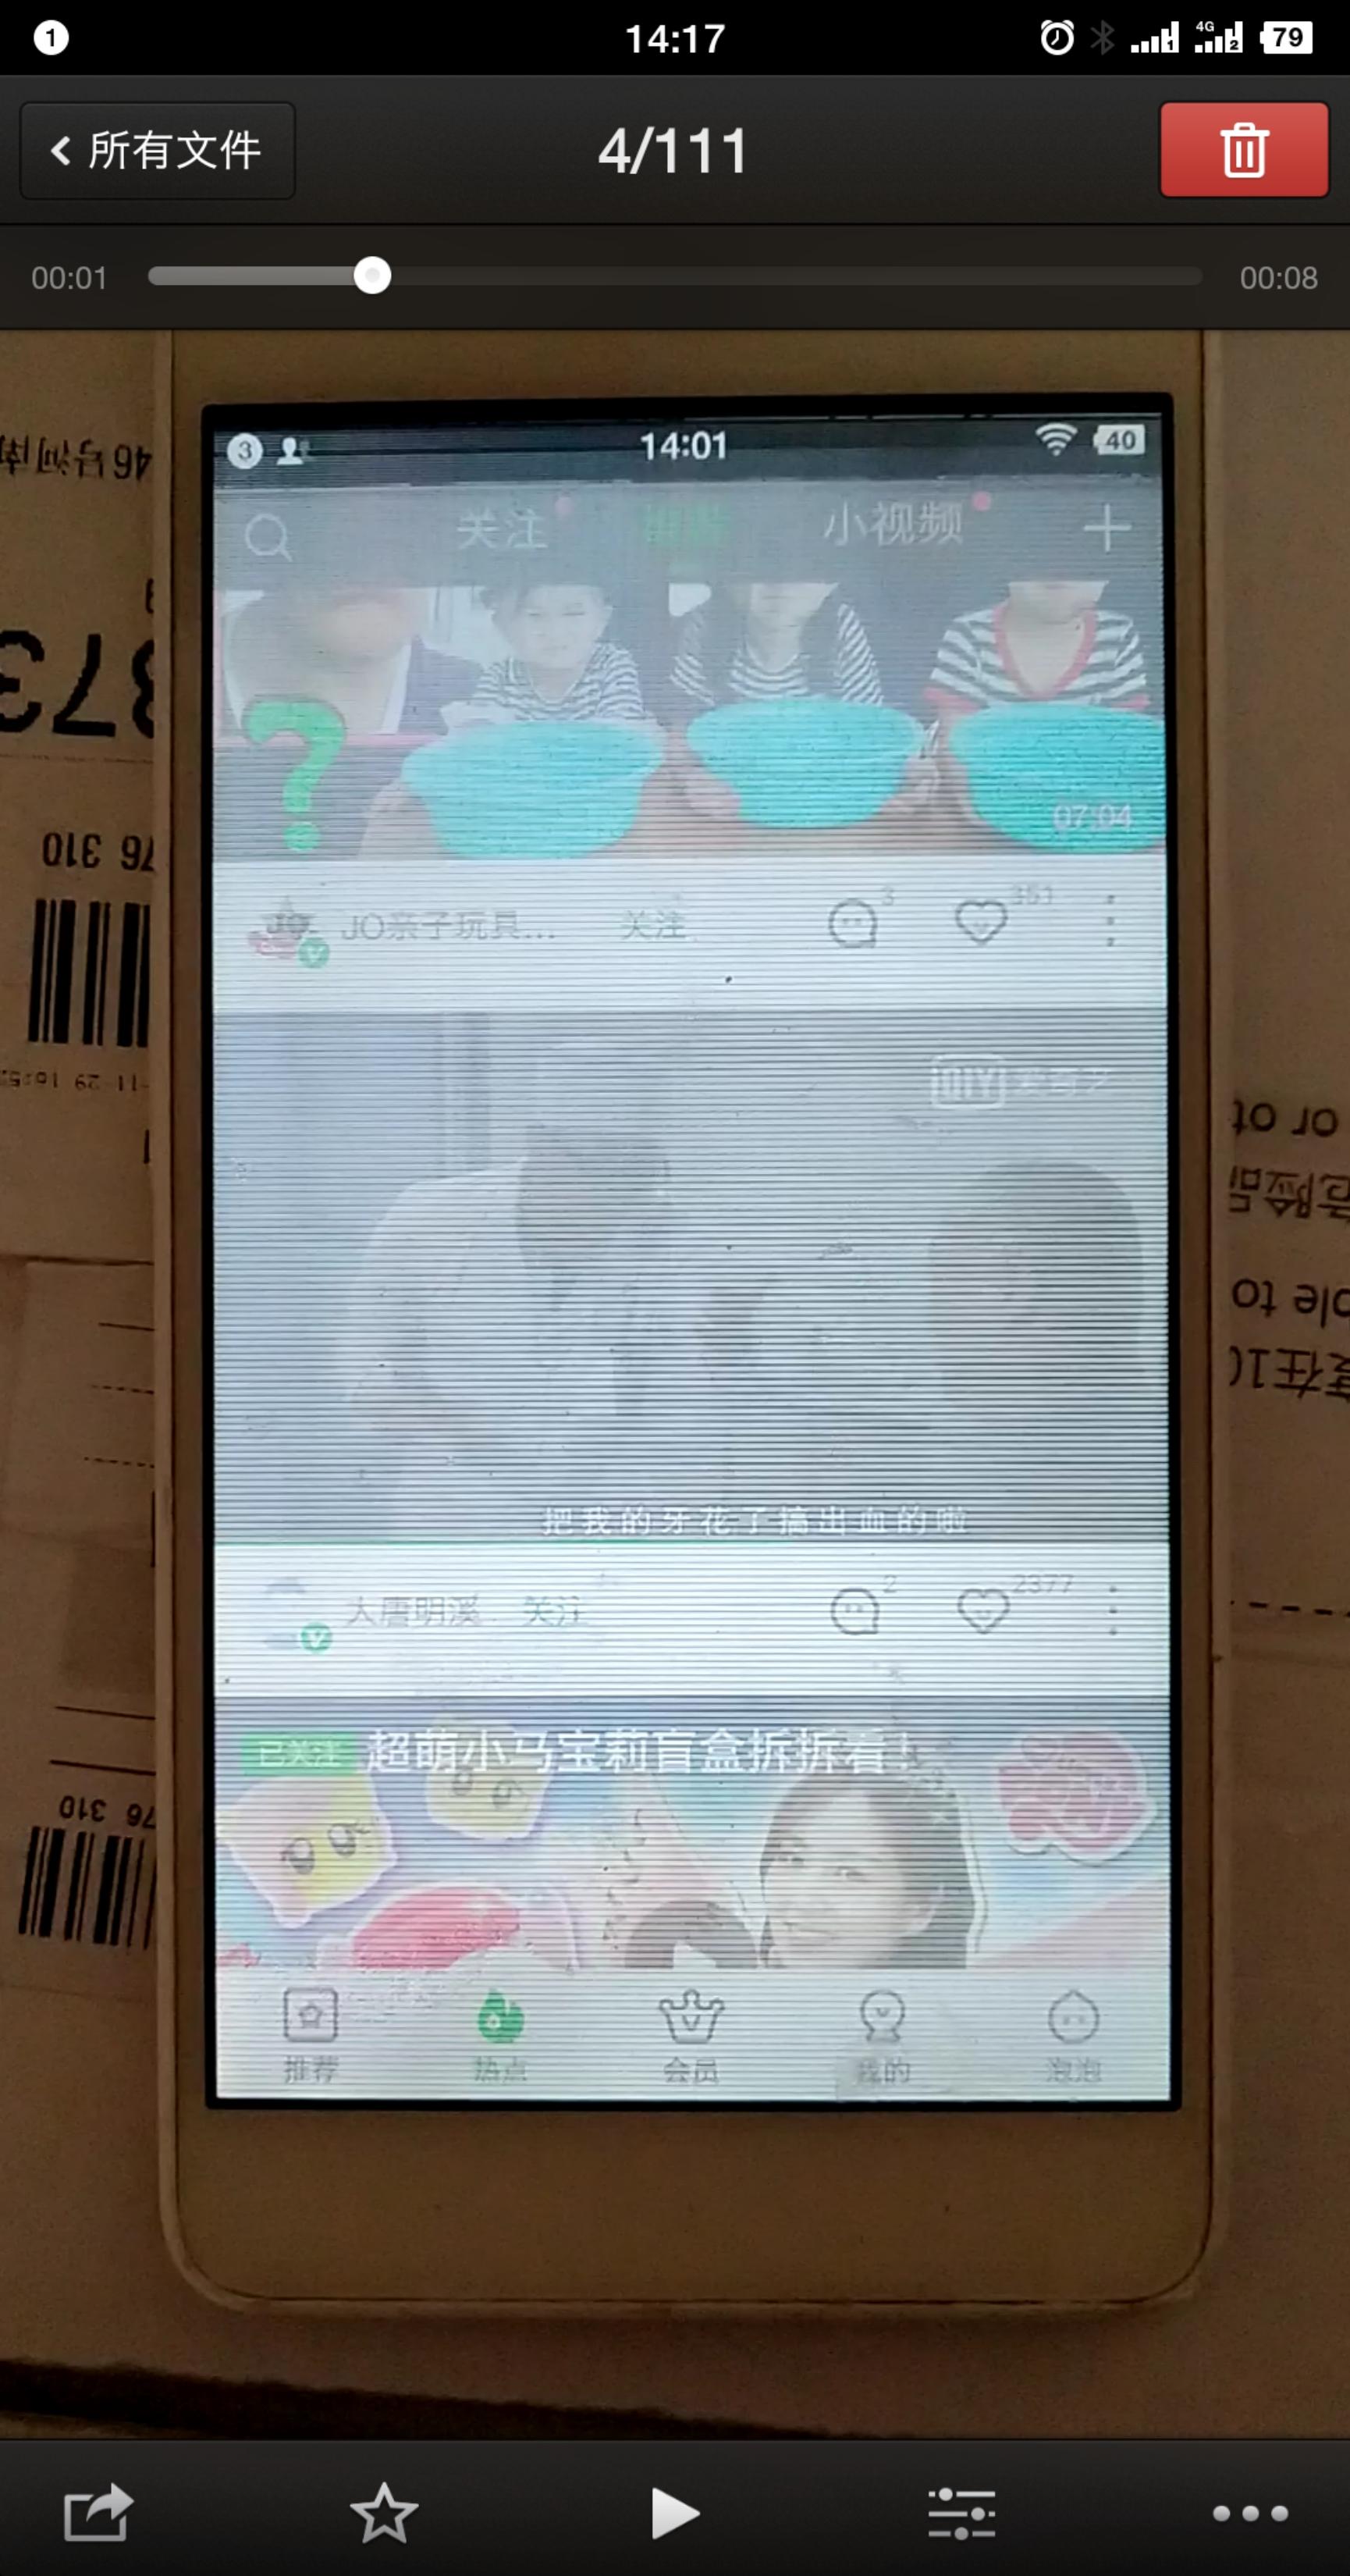 Screenshot_2018-12-20-14-17-07-335_??.png